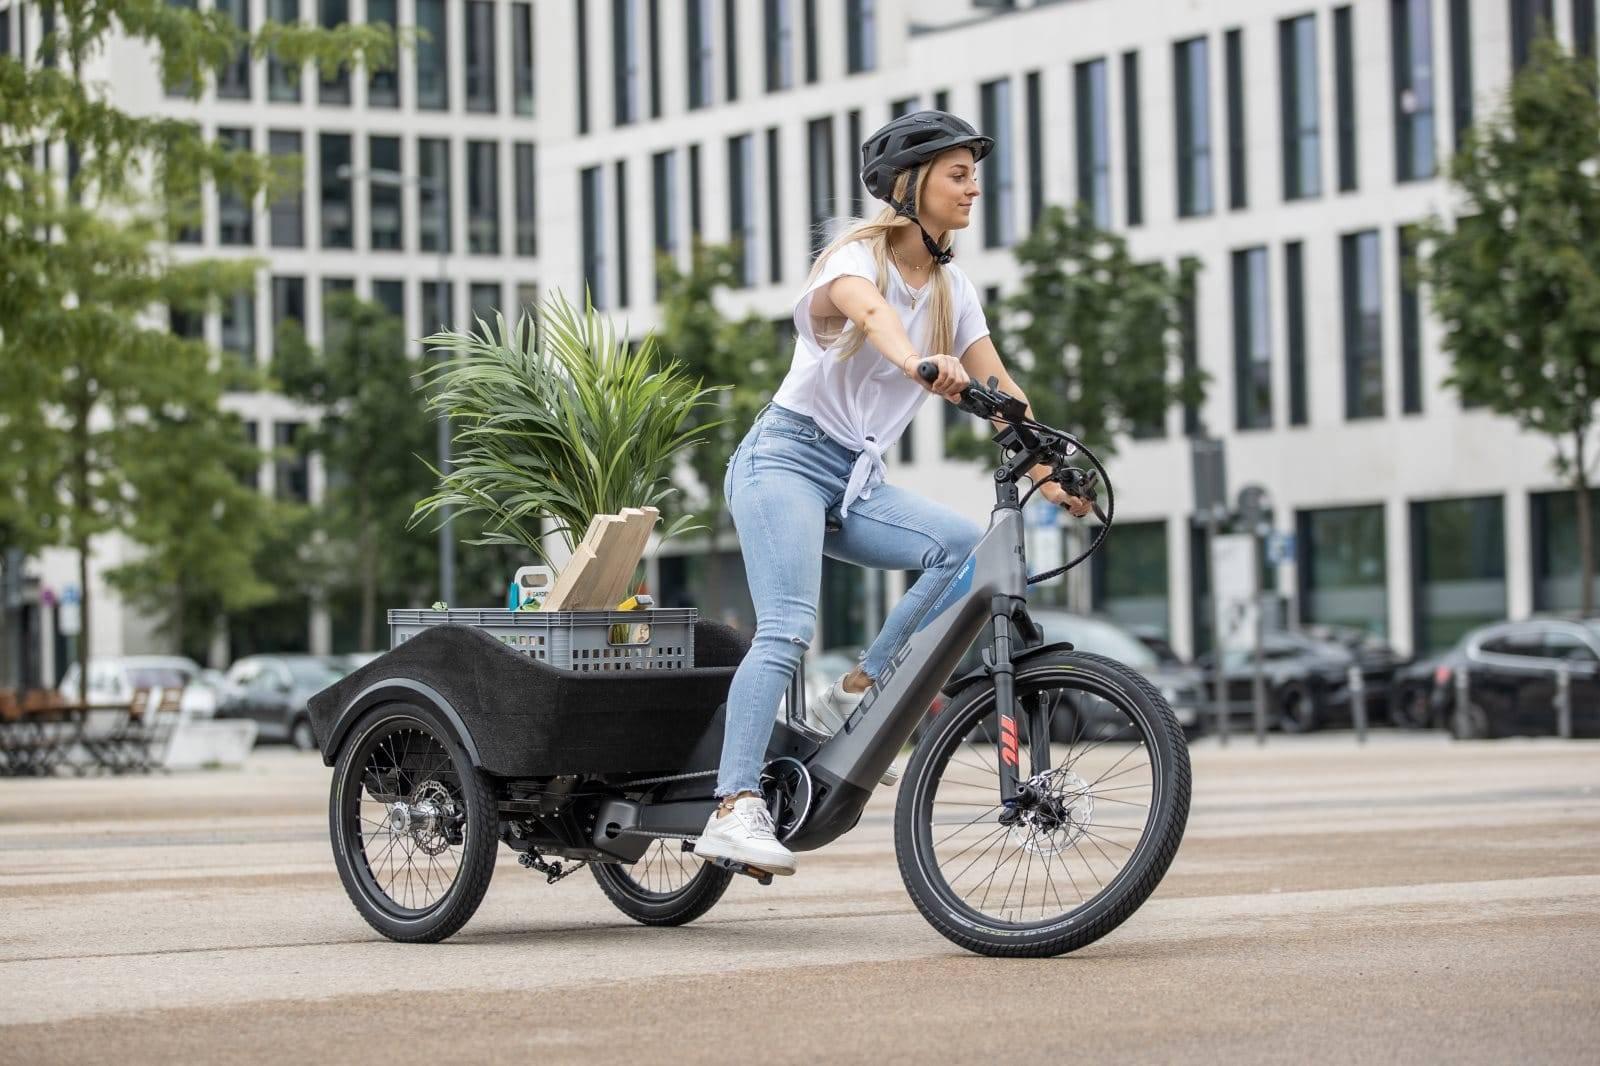 IAA Mobility 2021 - в центре внимания BMW Group Innovation Workshop 4